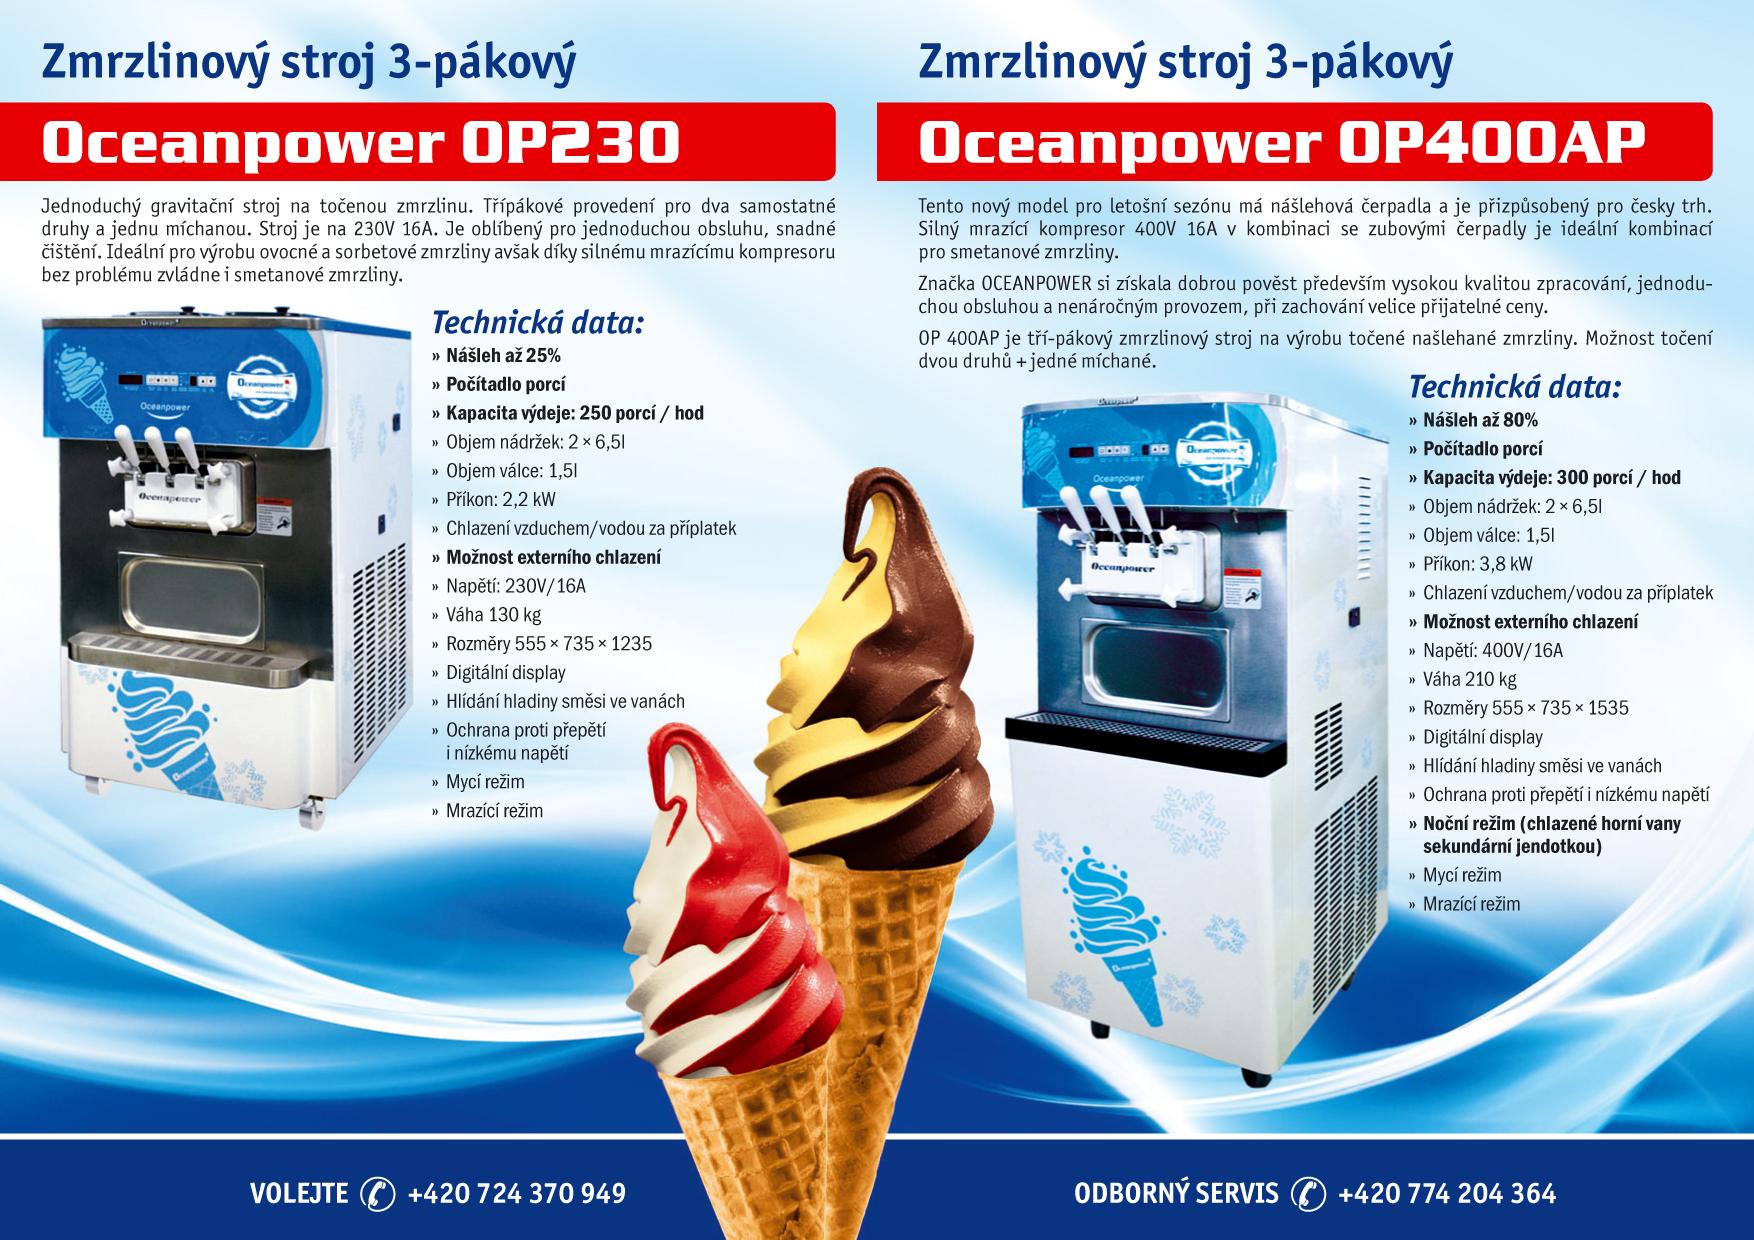 Zmrzlinový stroj Oceanpower OP MÍCHADLO